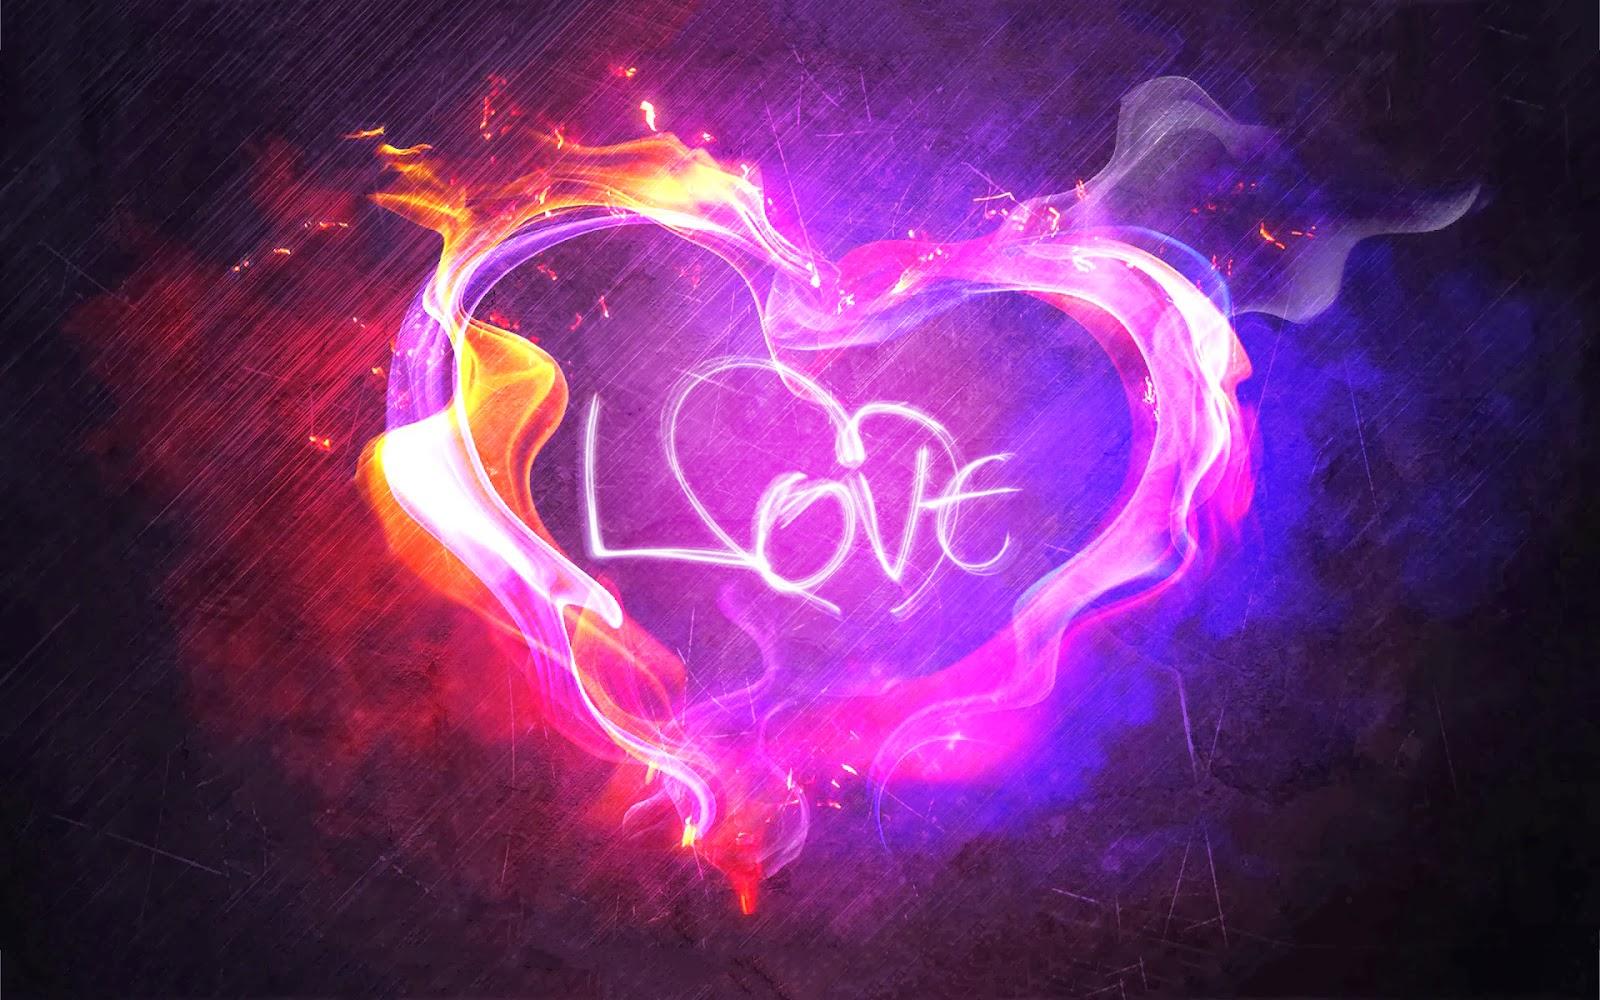 Heart love Flame Valentine Wallpaper